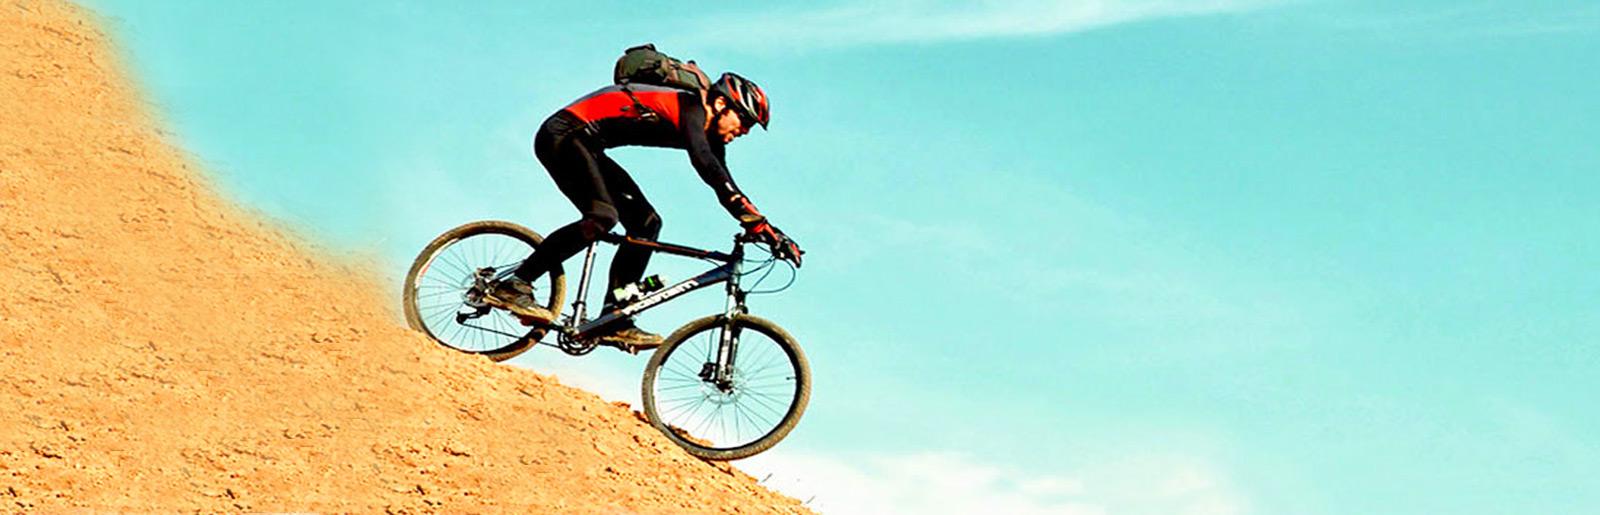 Lar National Park Mountain Biking and Tehran city tour